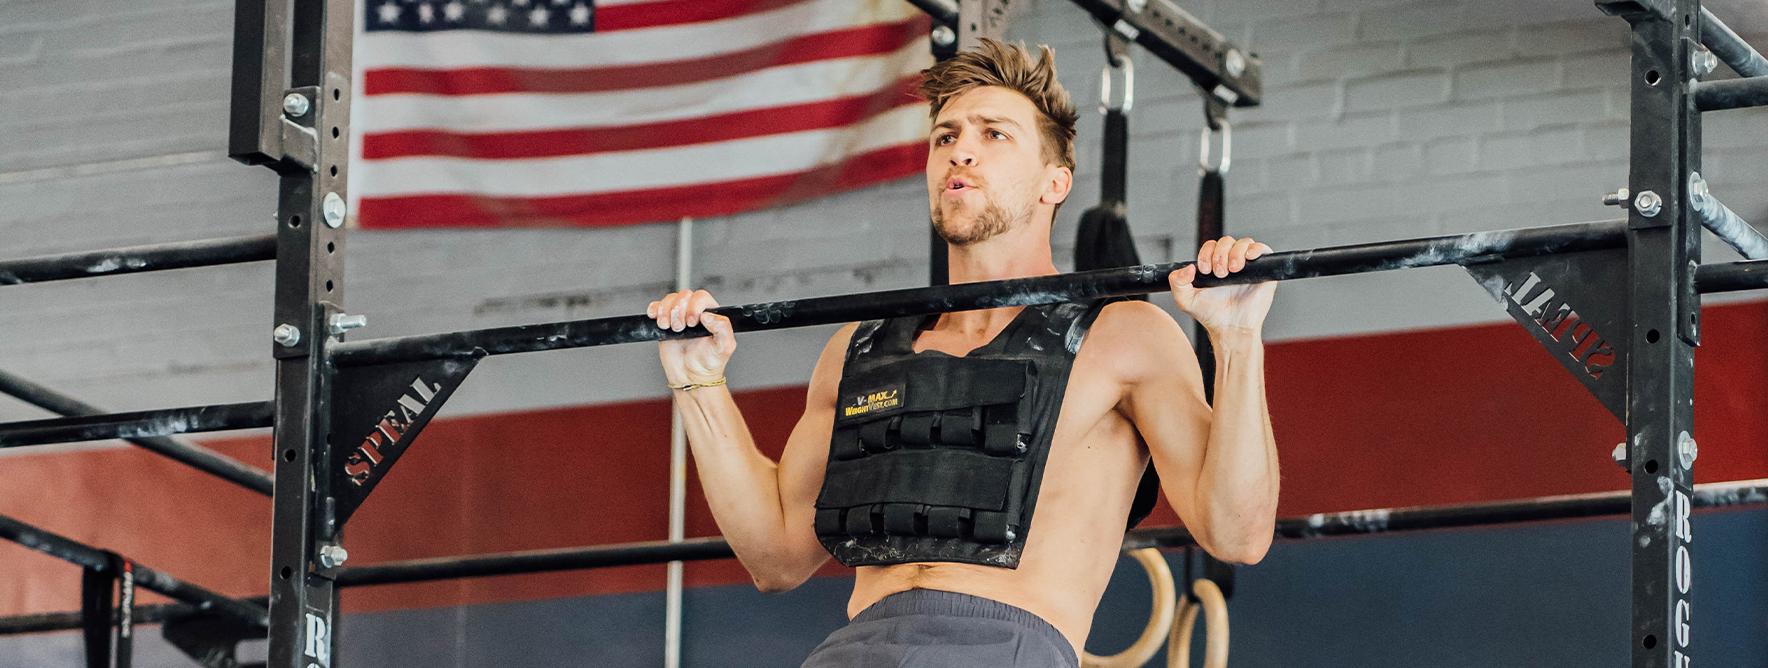 Robert Liberatore - tasc performance - climbing apparel